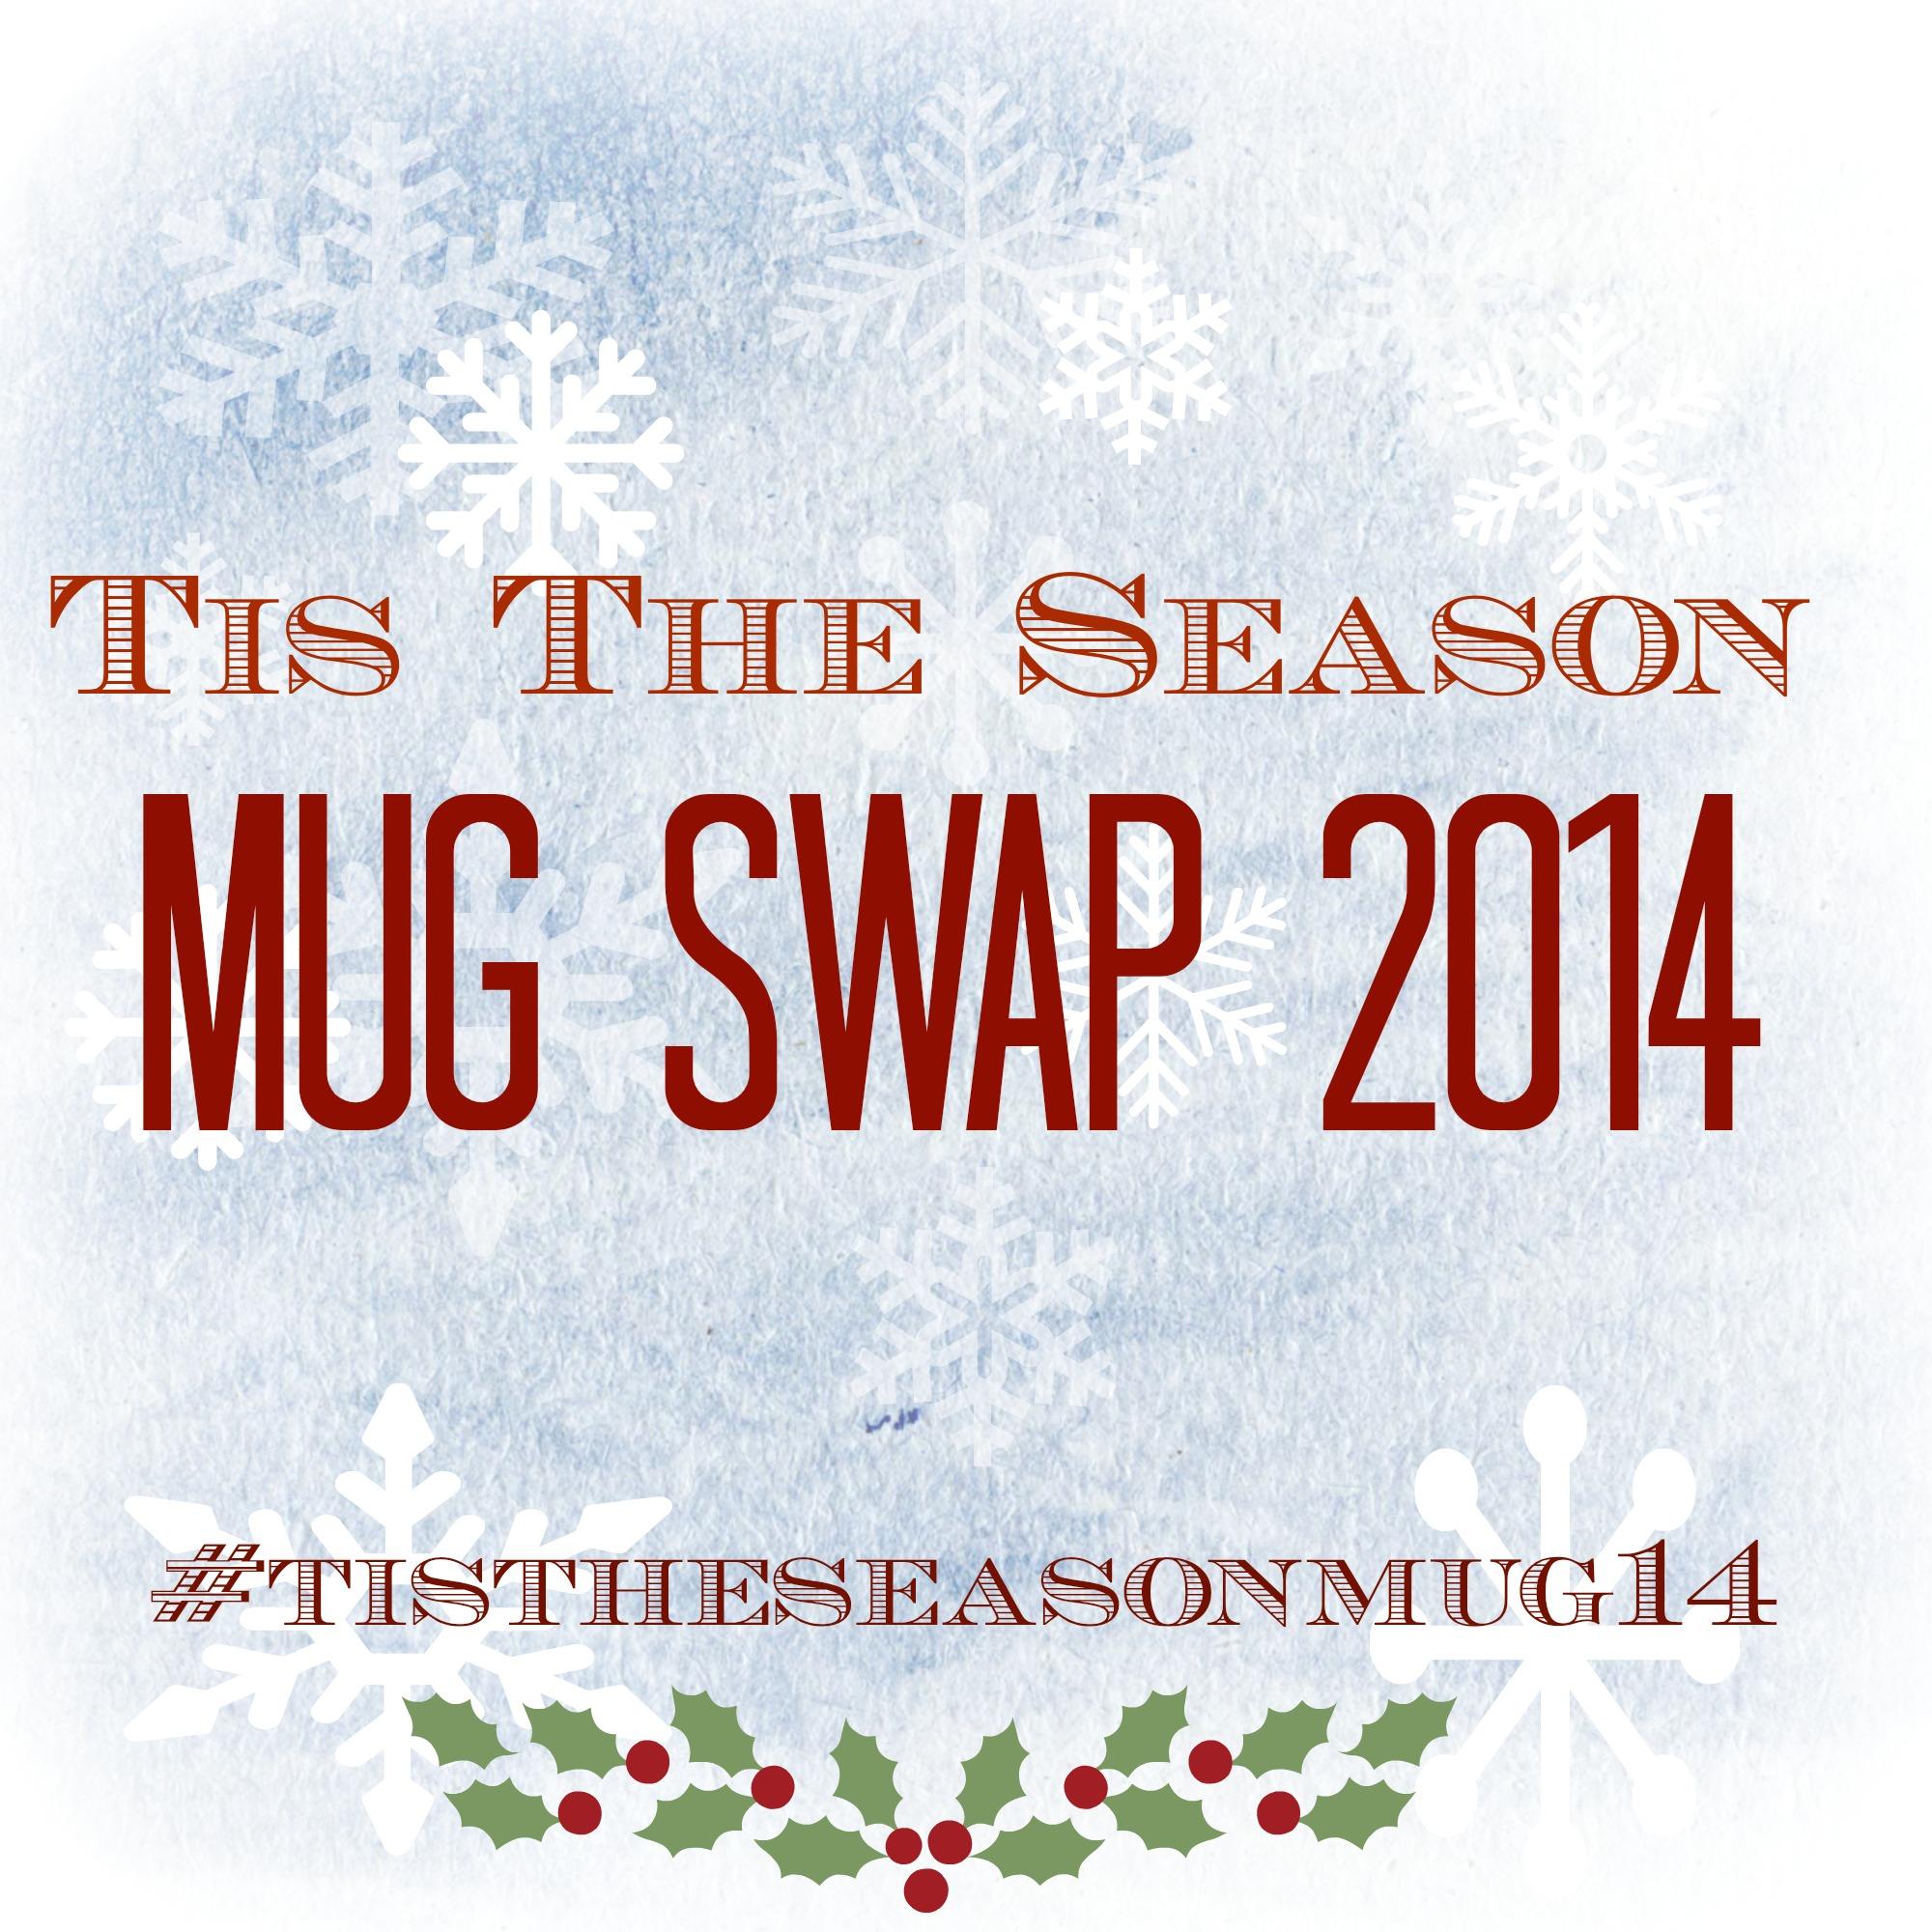 Tis the Season Mug Swap 2014